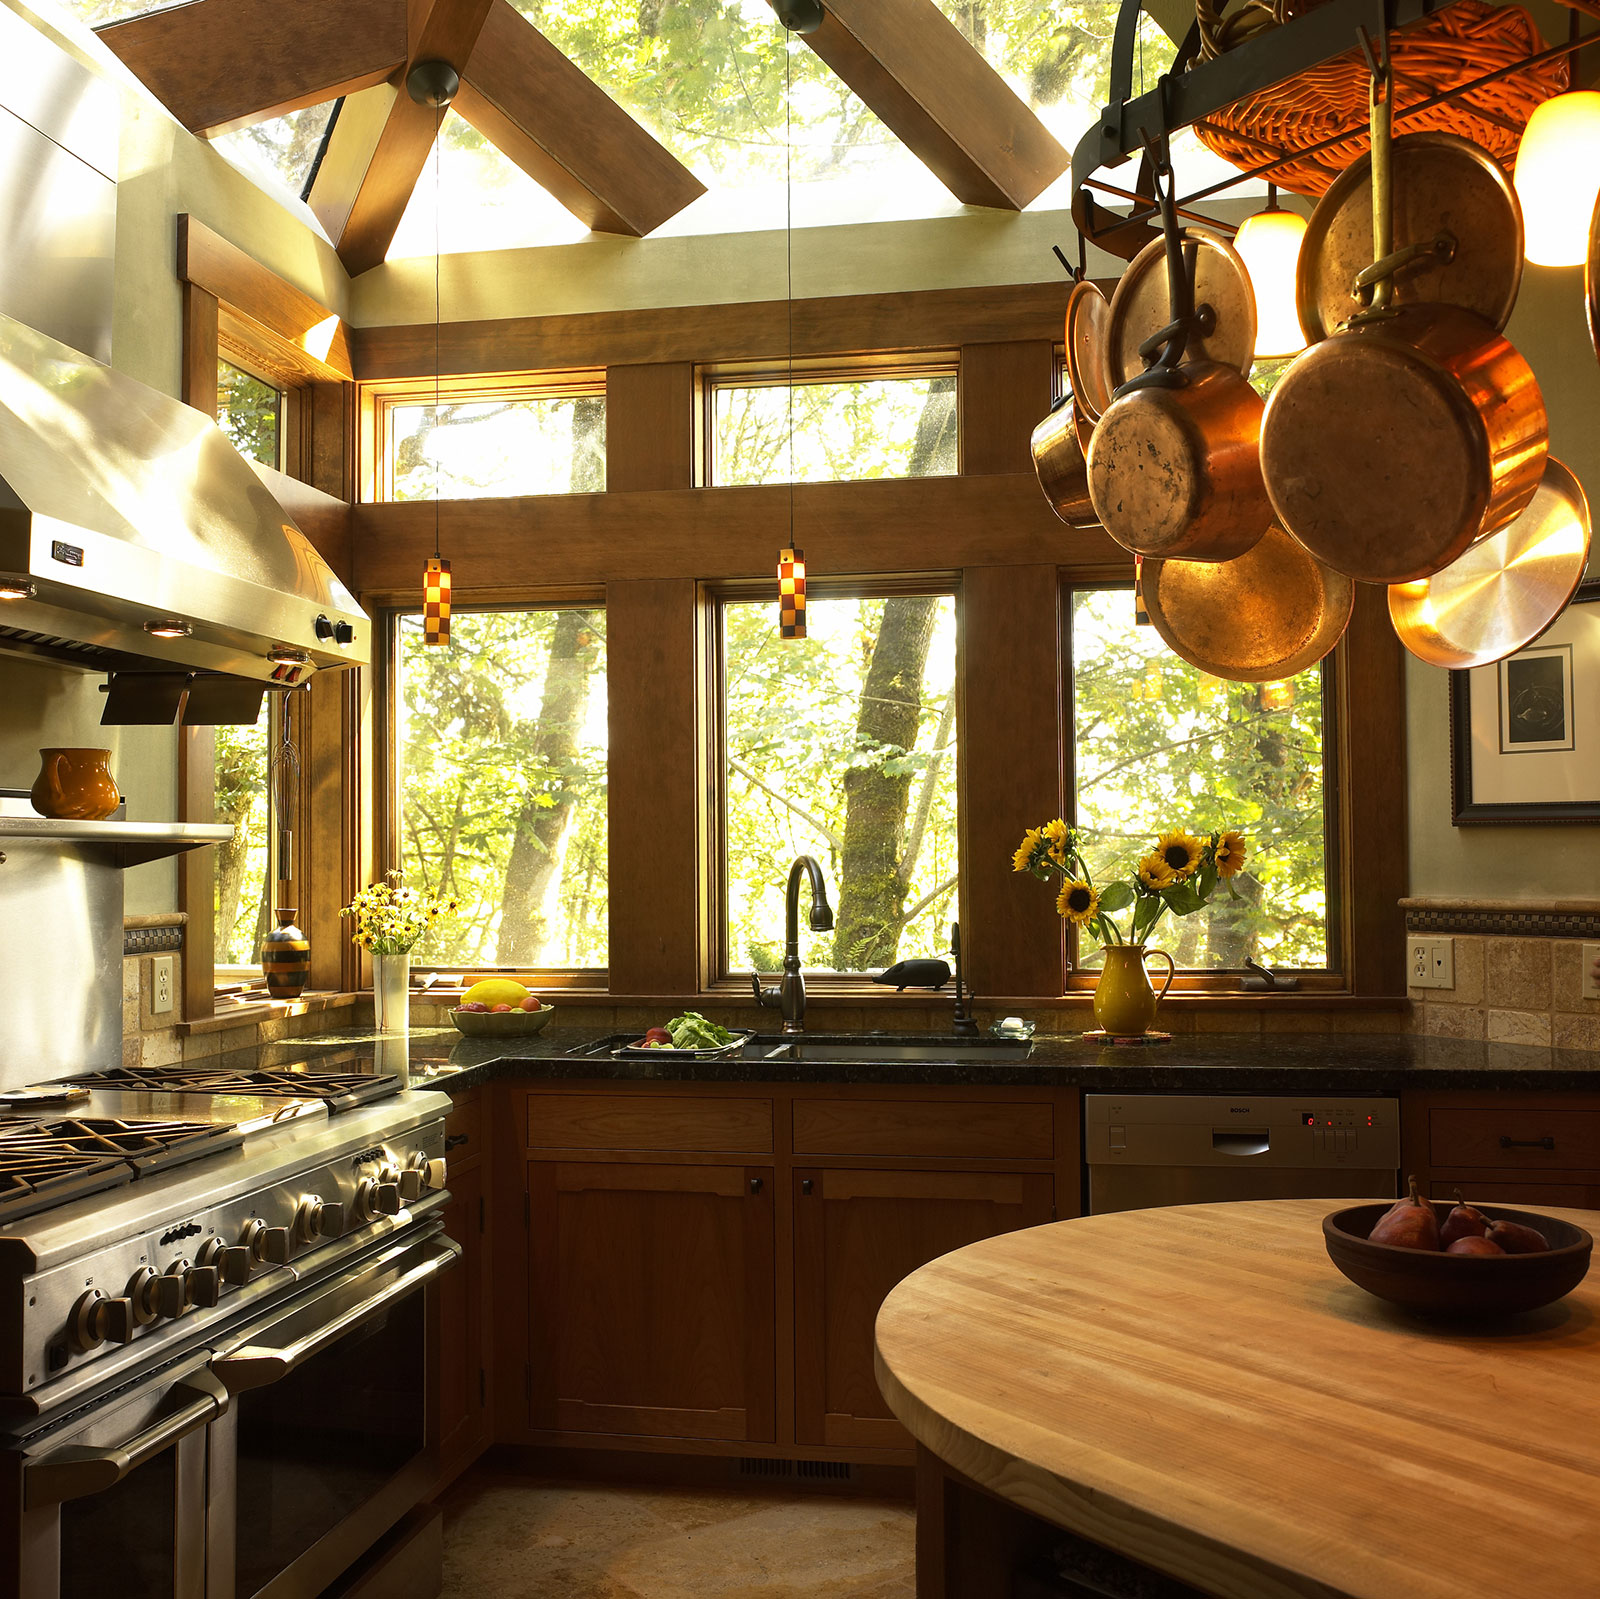 Chambers-Coda Kitchen Remodel